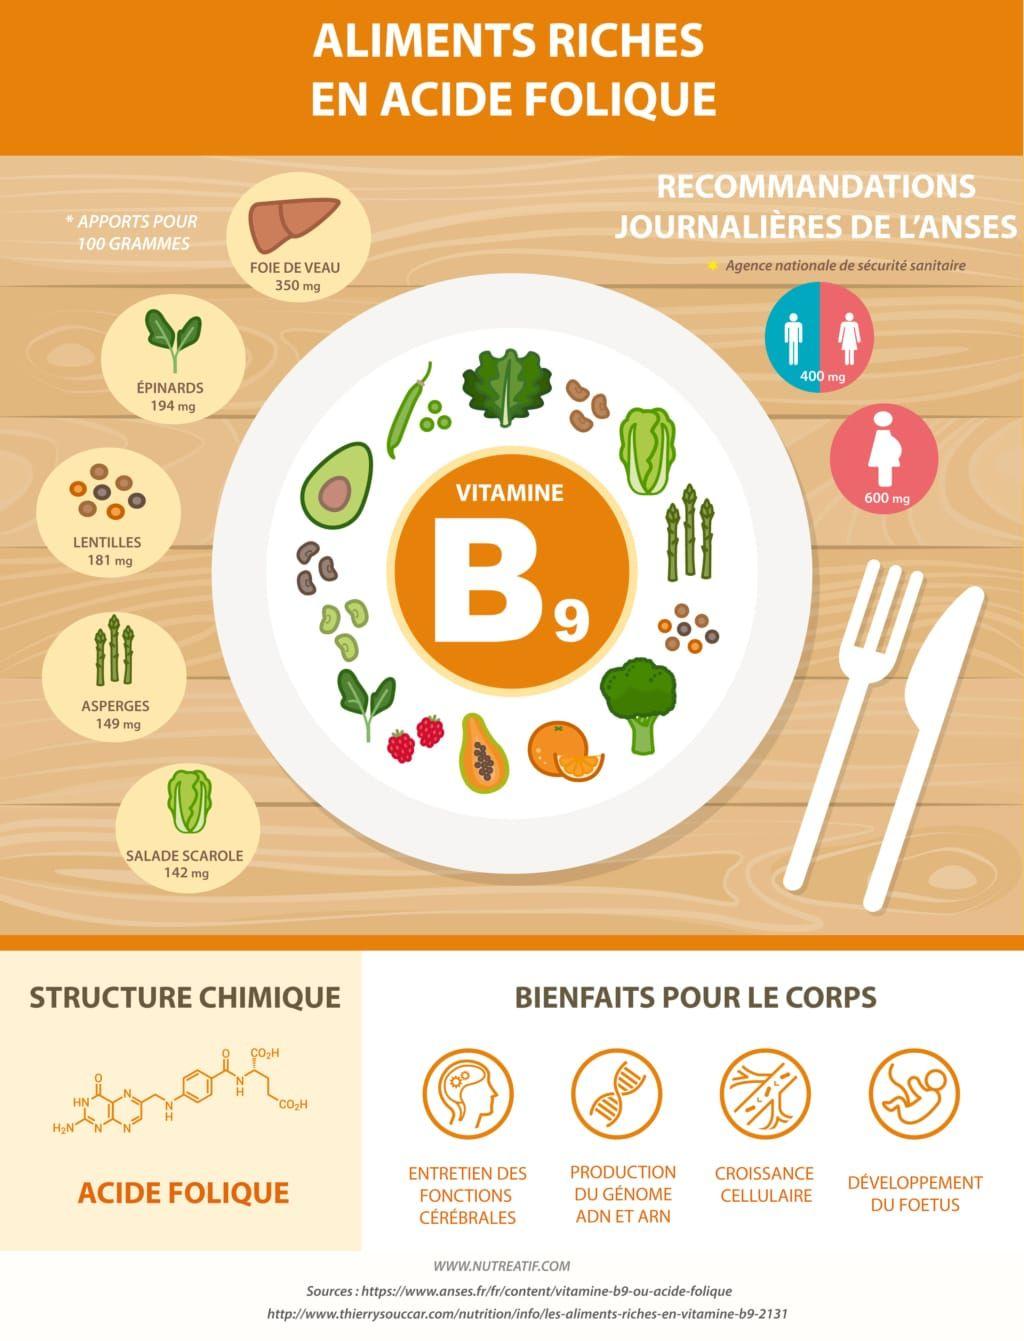 Aliments riches Vitamine B9 Acide folique #vitamineB9 # ...